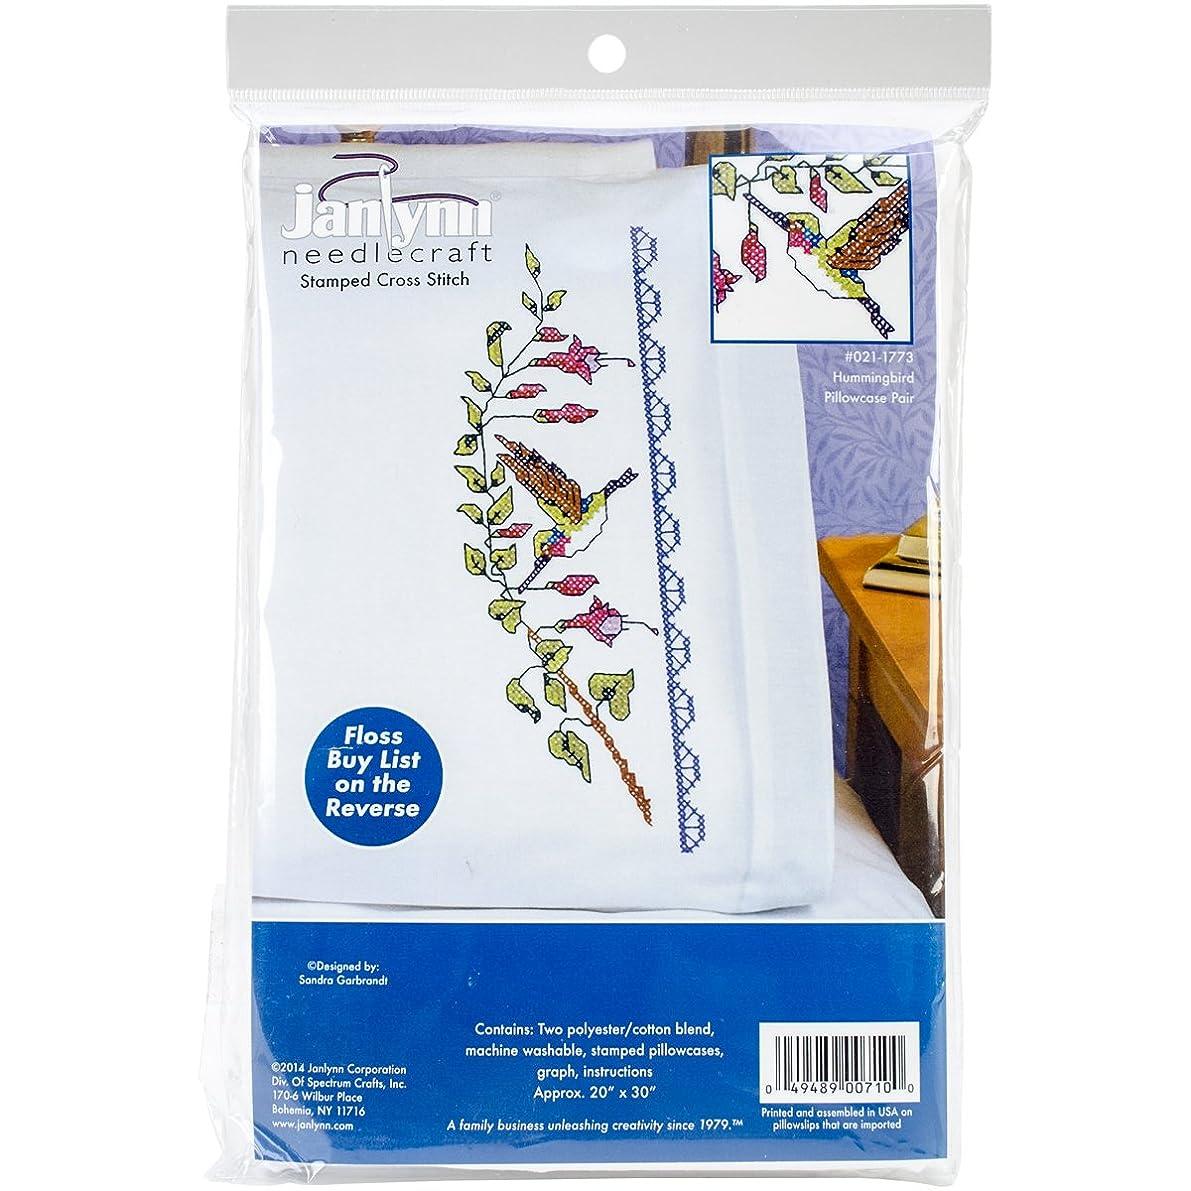 Janlynn Hummingbird Pillowcase Pair Stamped Cross Stitch, 20 by 30-Inch